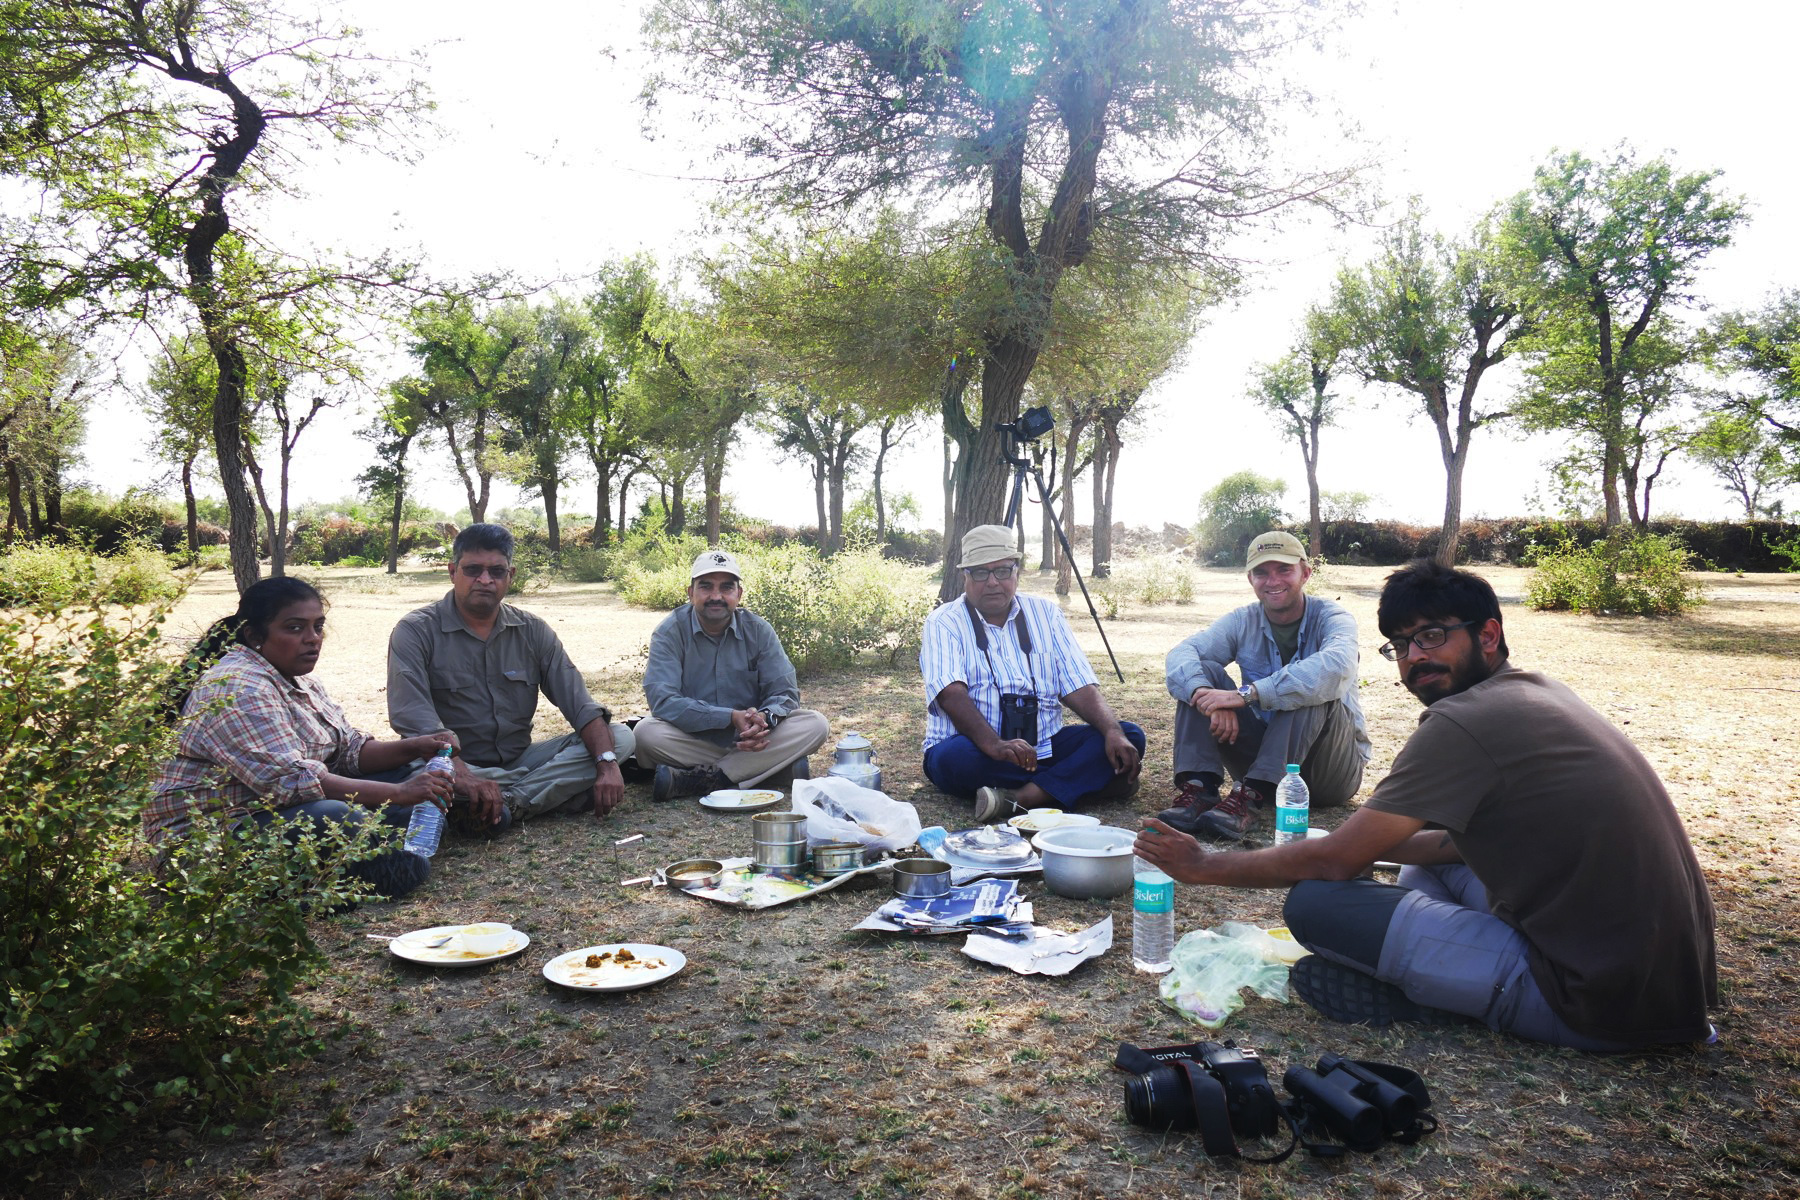 Padmini, Badri, Dhanajai, Poonia, Noah, and Ramit take an afternoon picnic. Noah Strycker